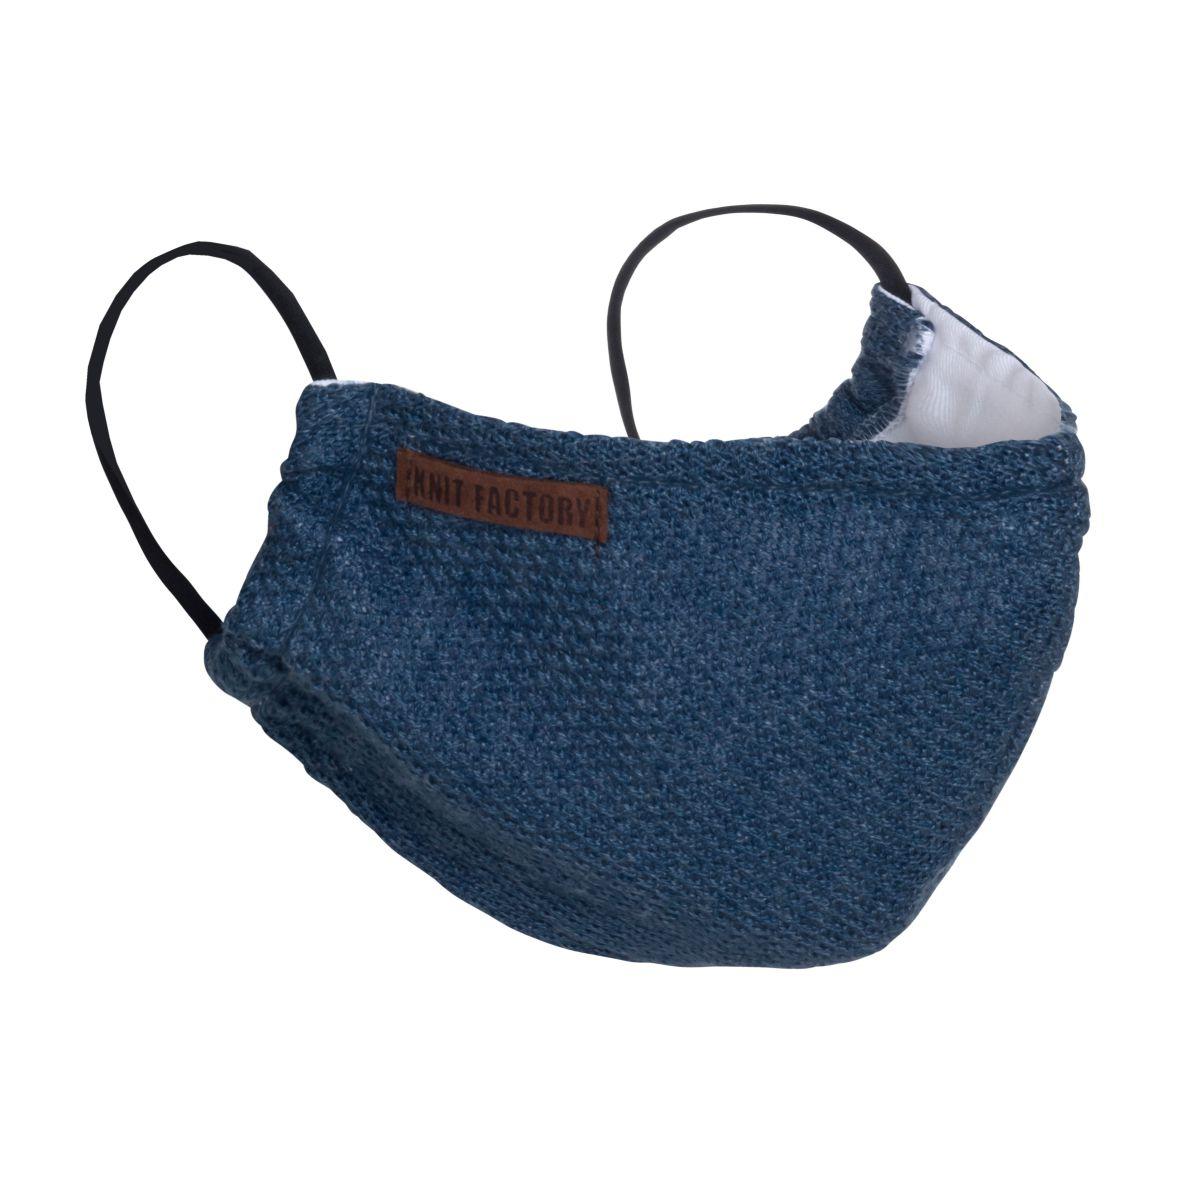 knit factory kf13010501350 lola mondmasker jeans 1